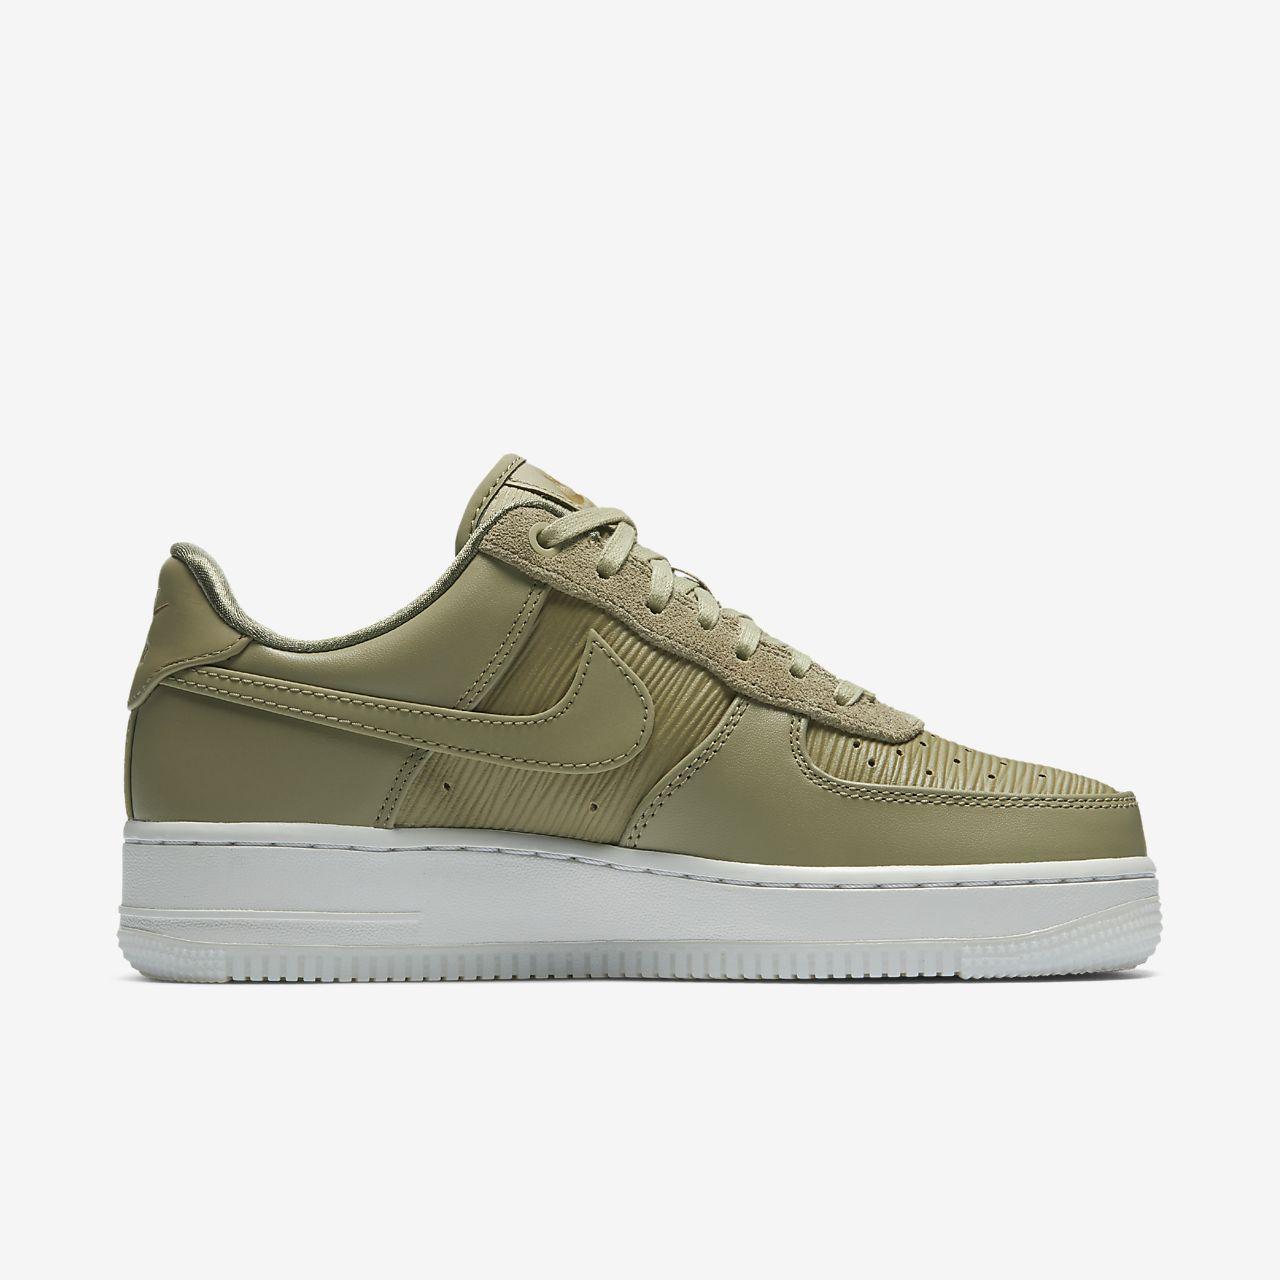 NIKE Baskets Air Force 1 07 Chaussures Homme GX8R7bKn